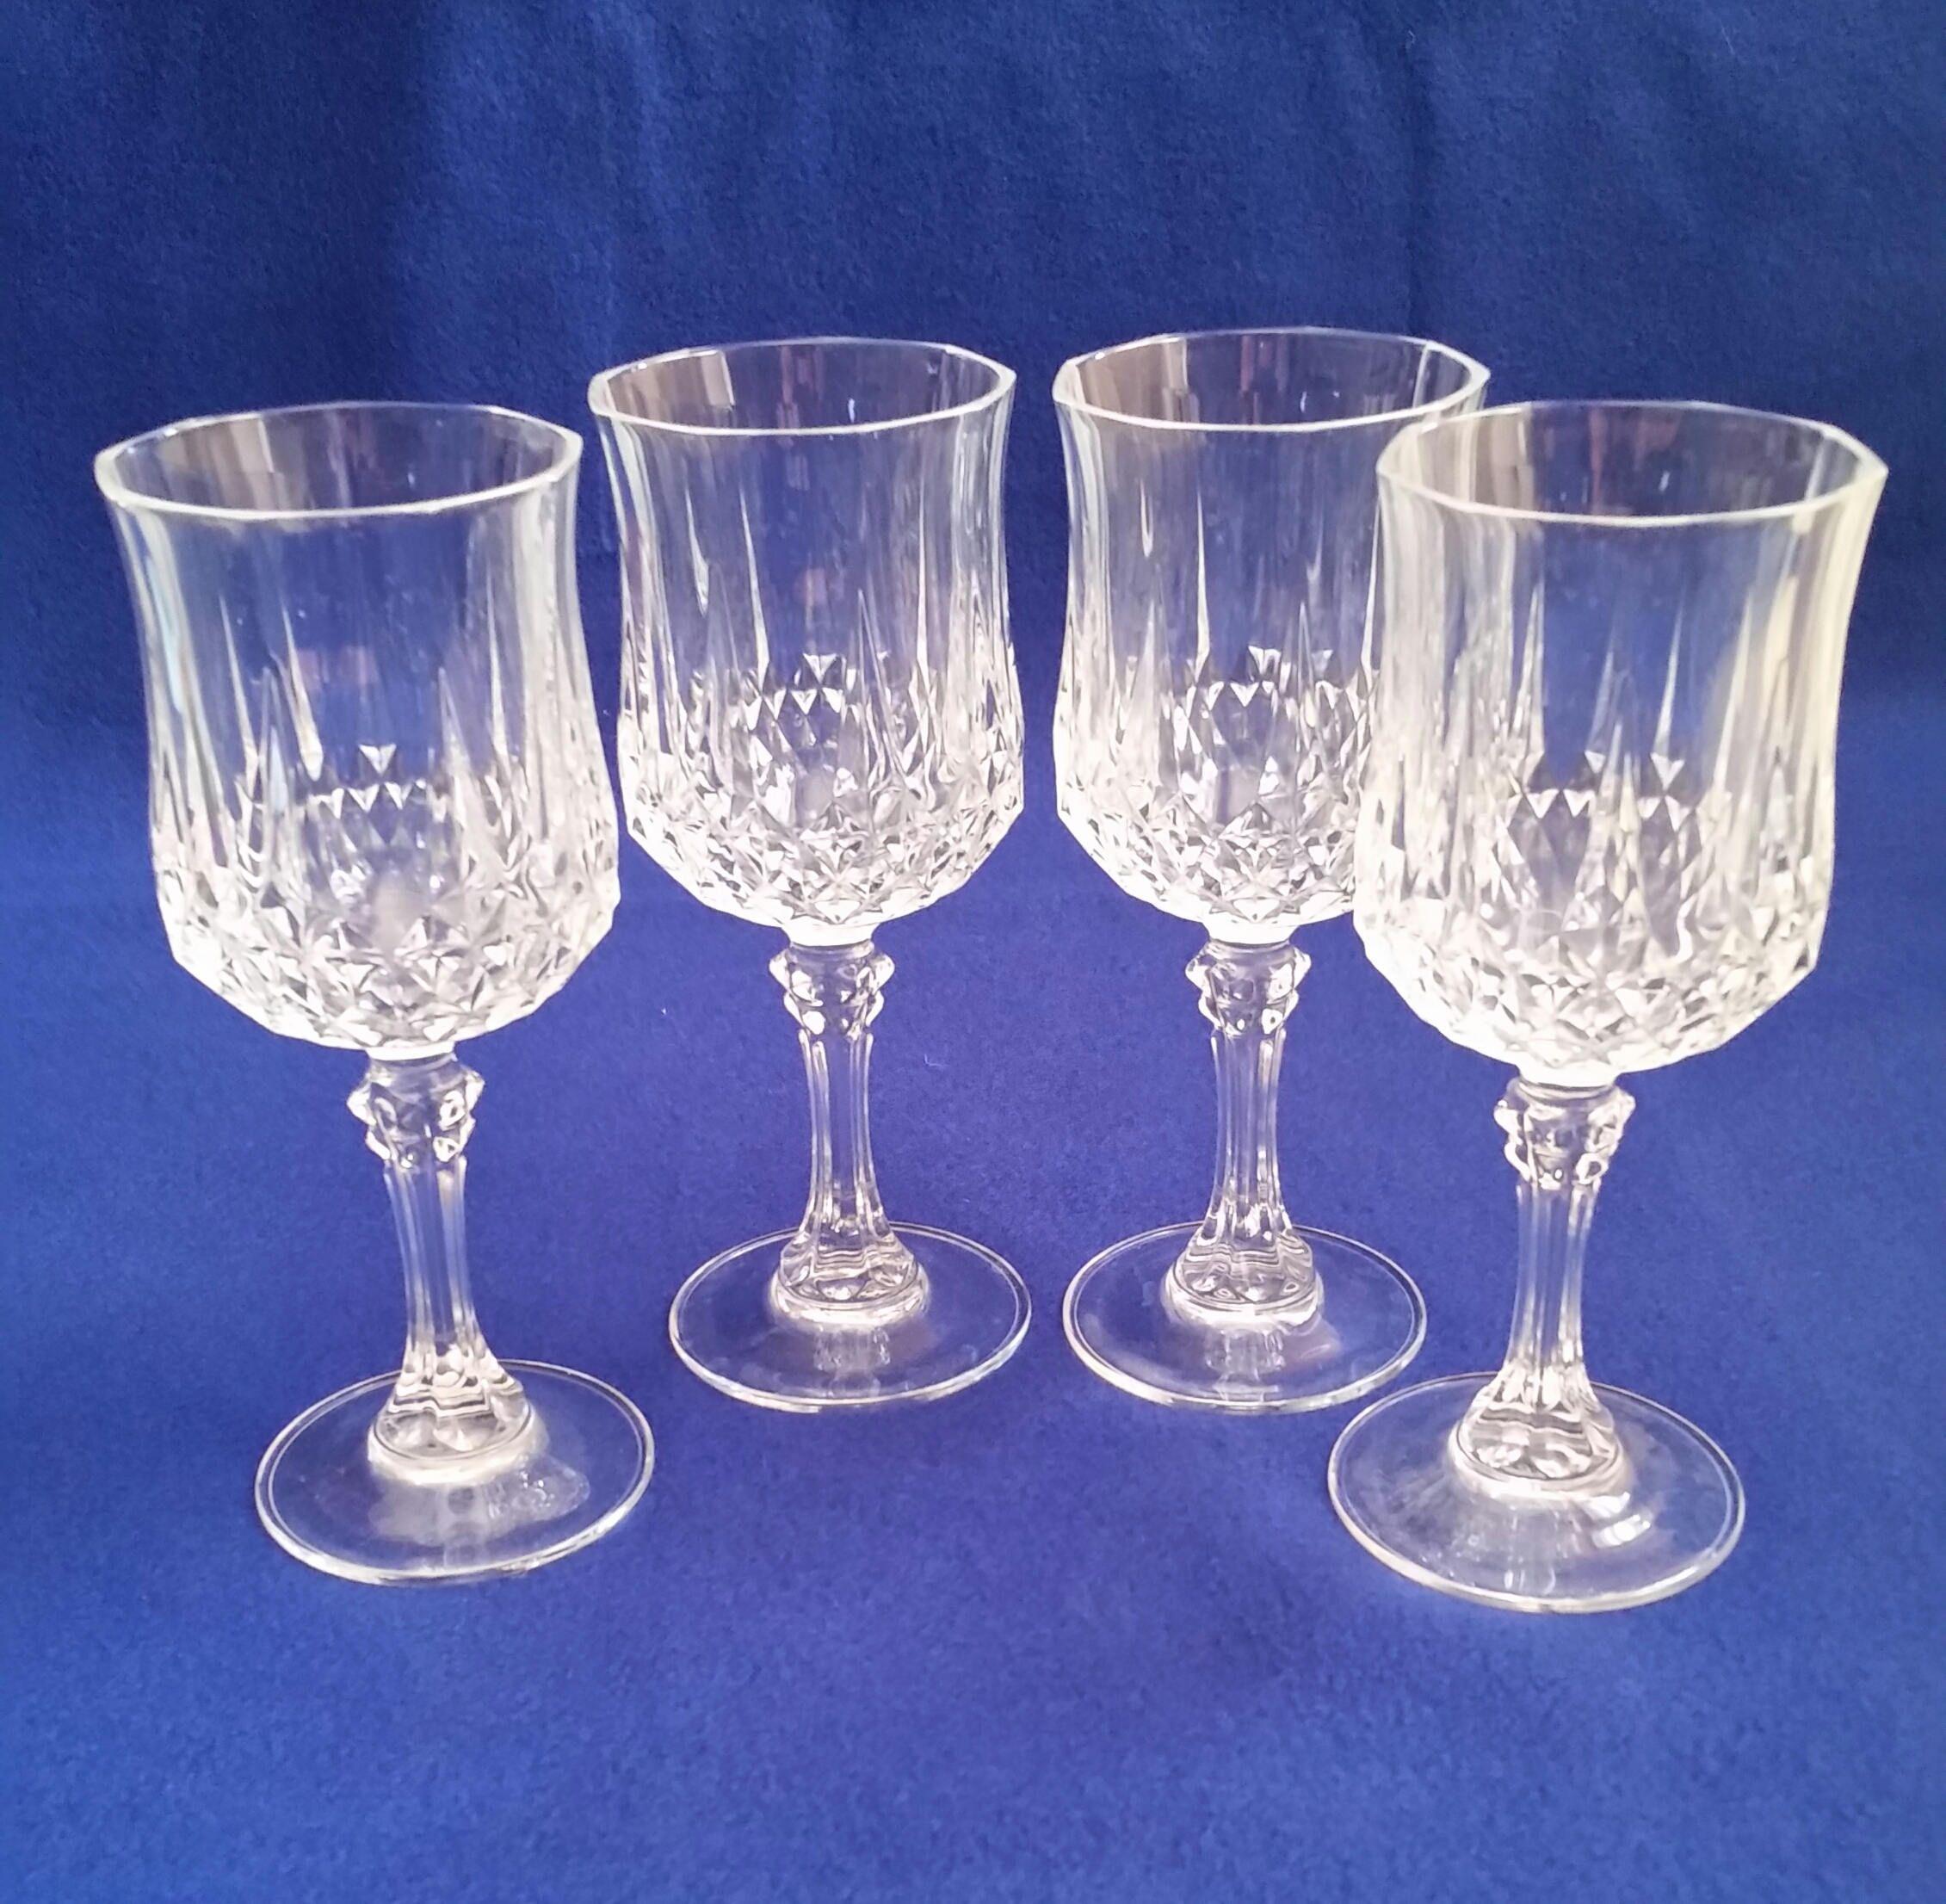 Cristal D Arques Longchamp Wine Glasses Crystal Wine Glasses Vintage Wedding Crystal Wine Glasses Wedding Crystal Barware Crystal Set Of 4 Wedding Wine Glasses Crystal Wine Glasses Crystal Stemware